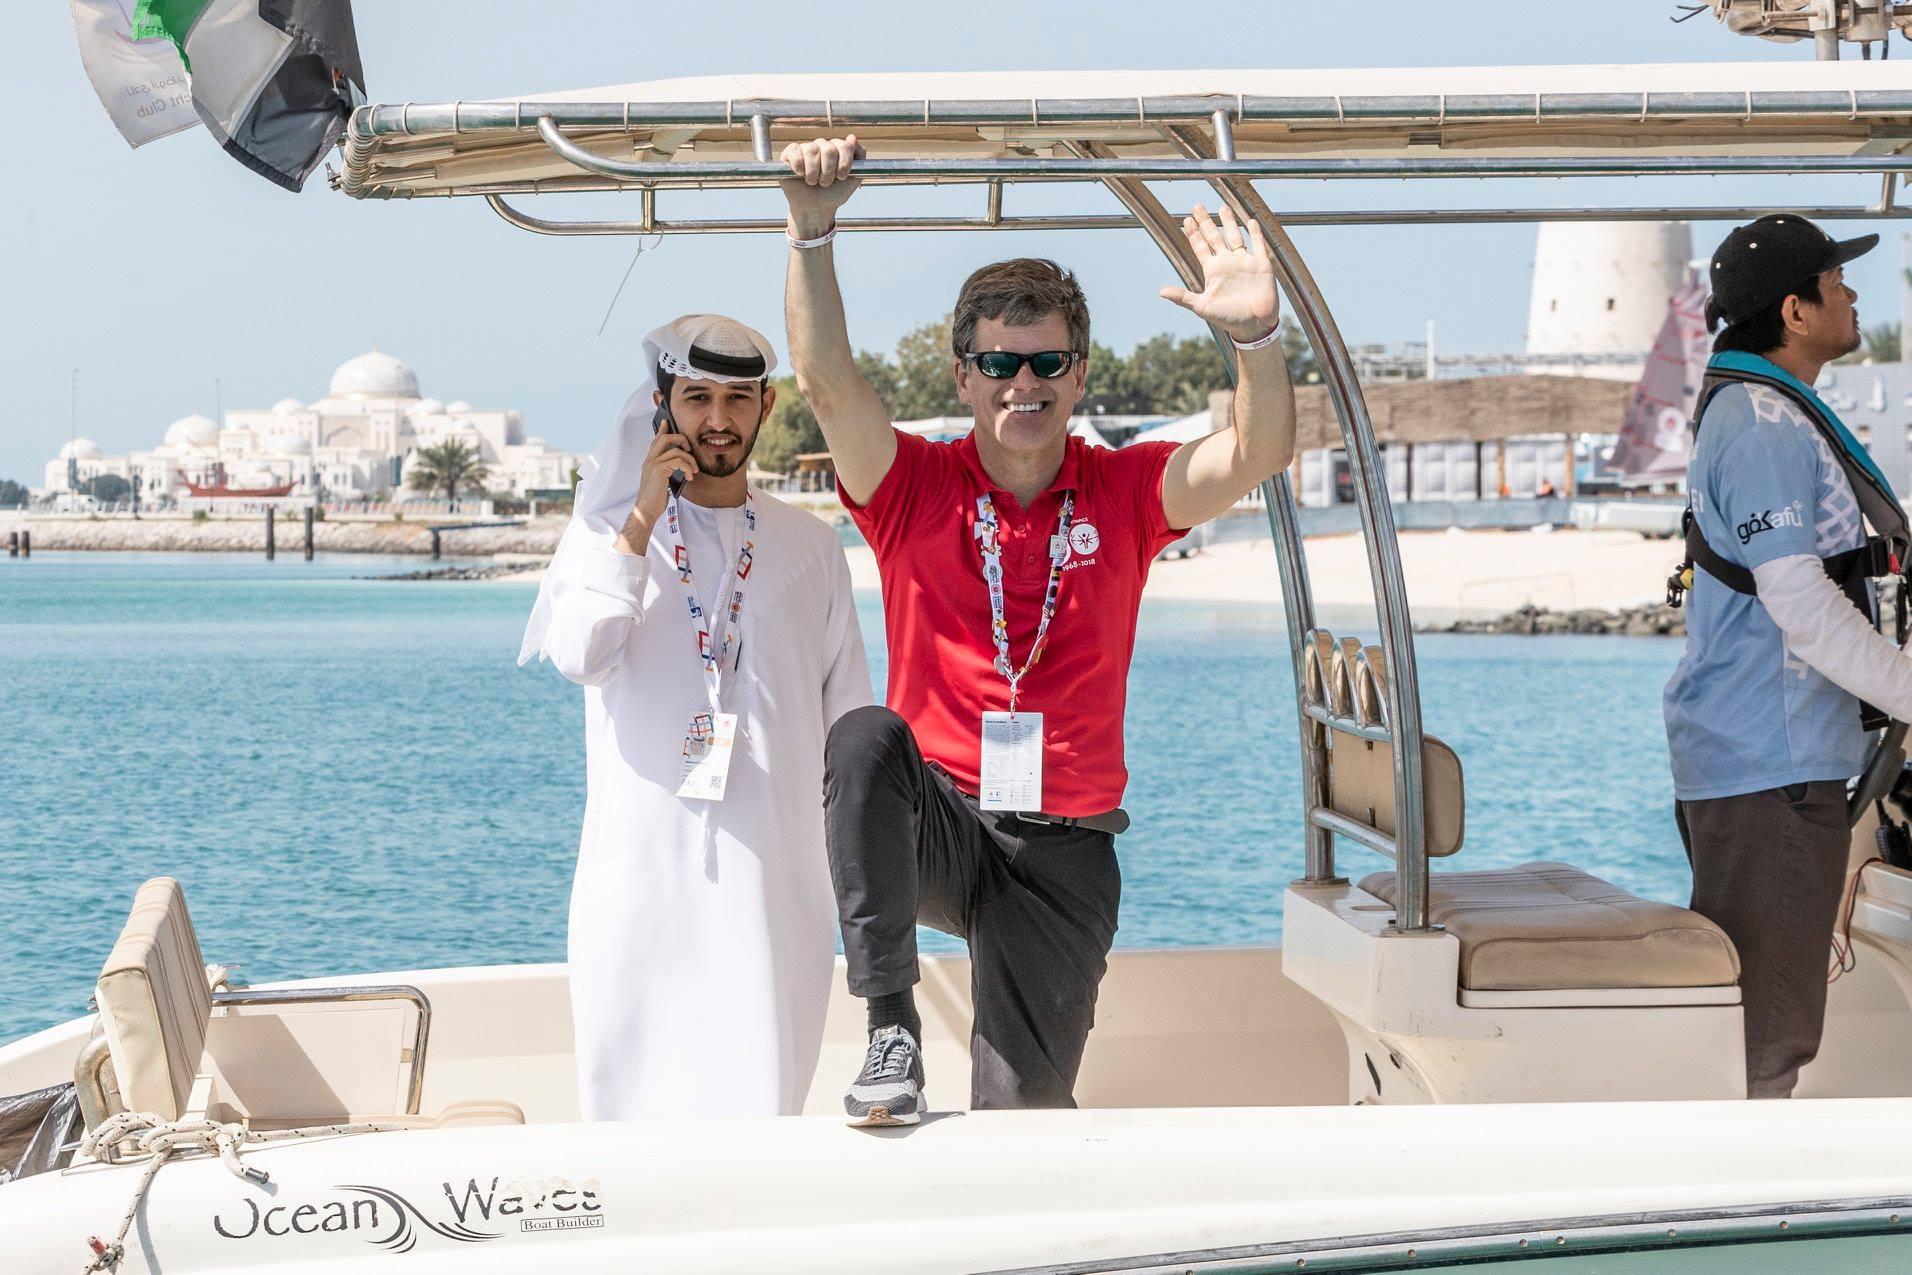 Day 6 - Abu Dhabi Sailing and Yacht Club